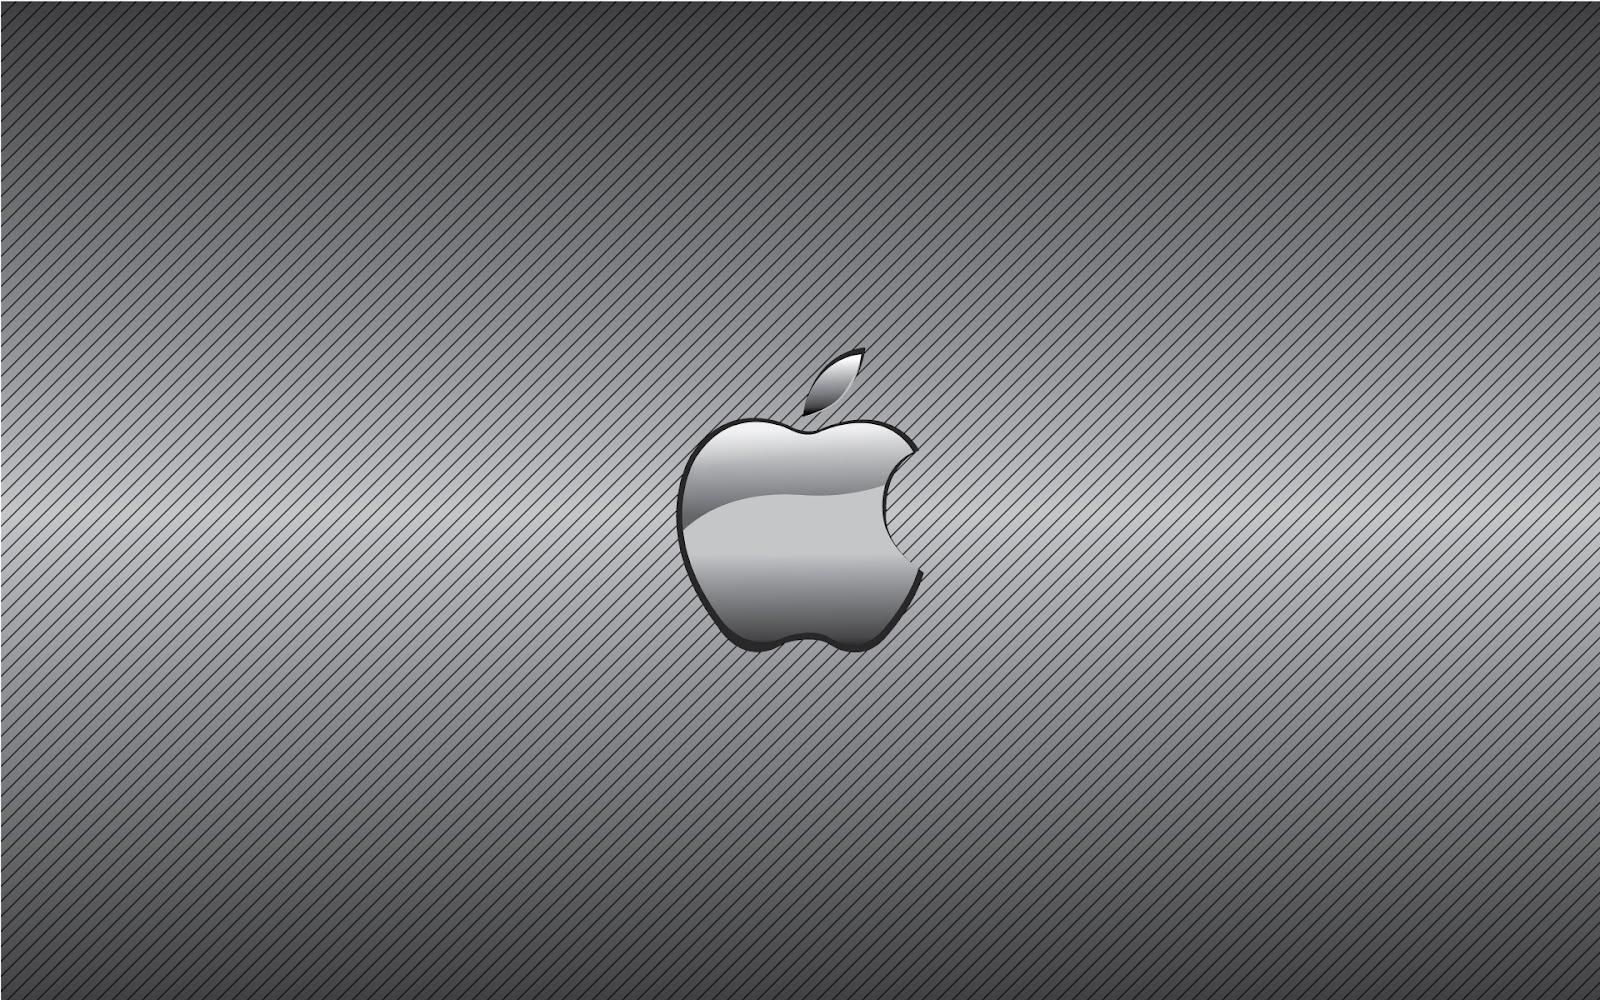 hd wallpapers apple iphone hd wallpapers apple iphone hd wallpapers 1600x1000